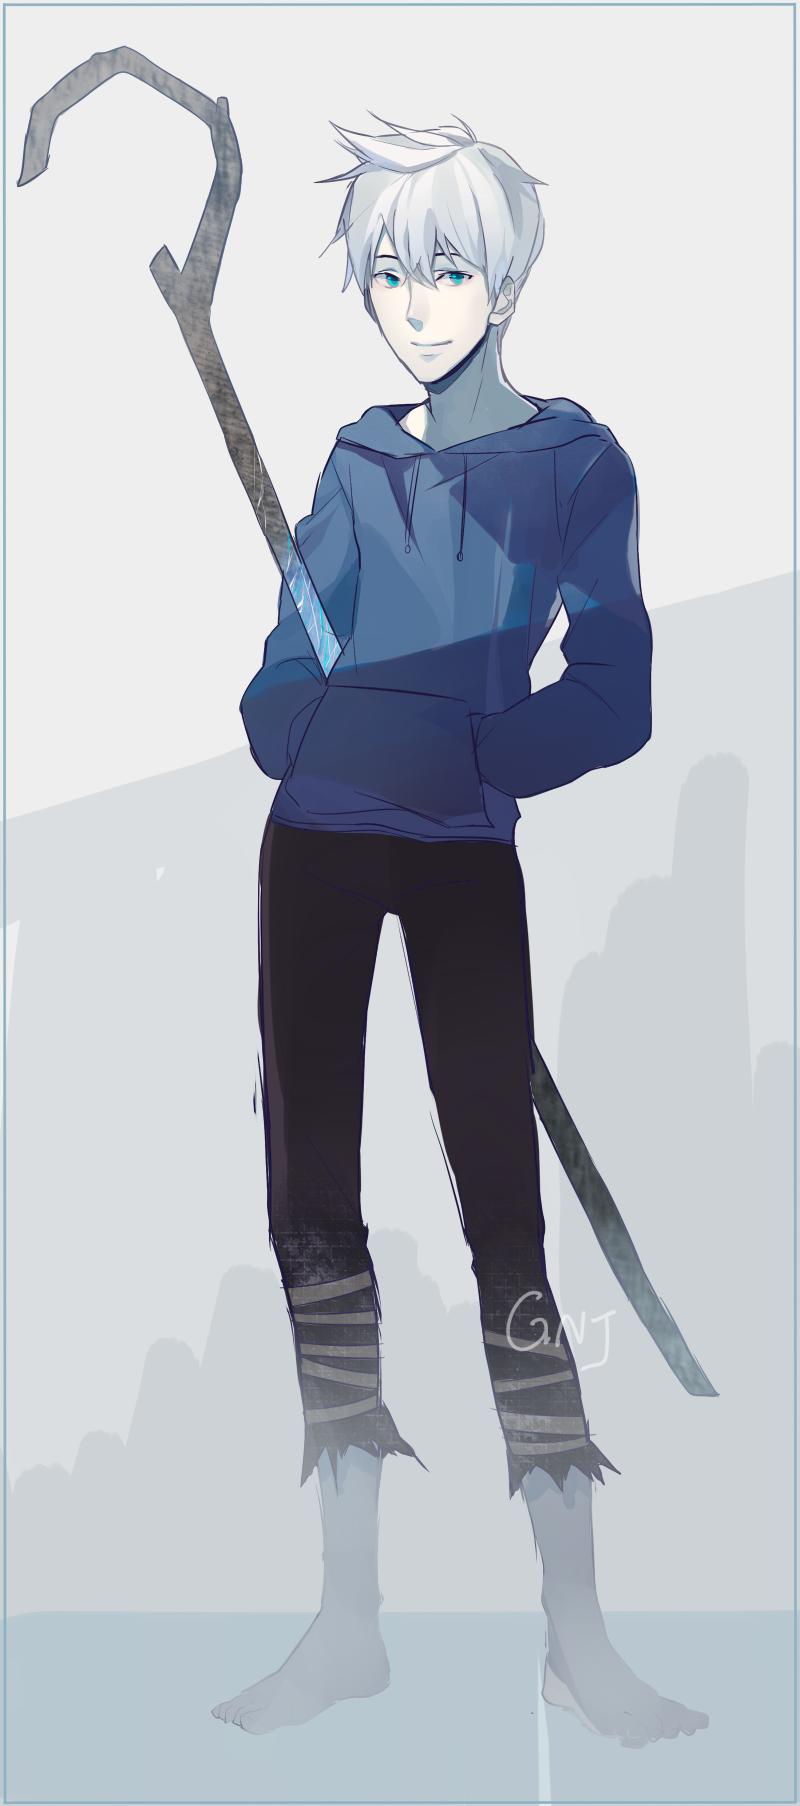 Jack Frost by GotNoJob